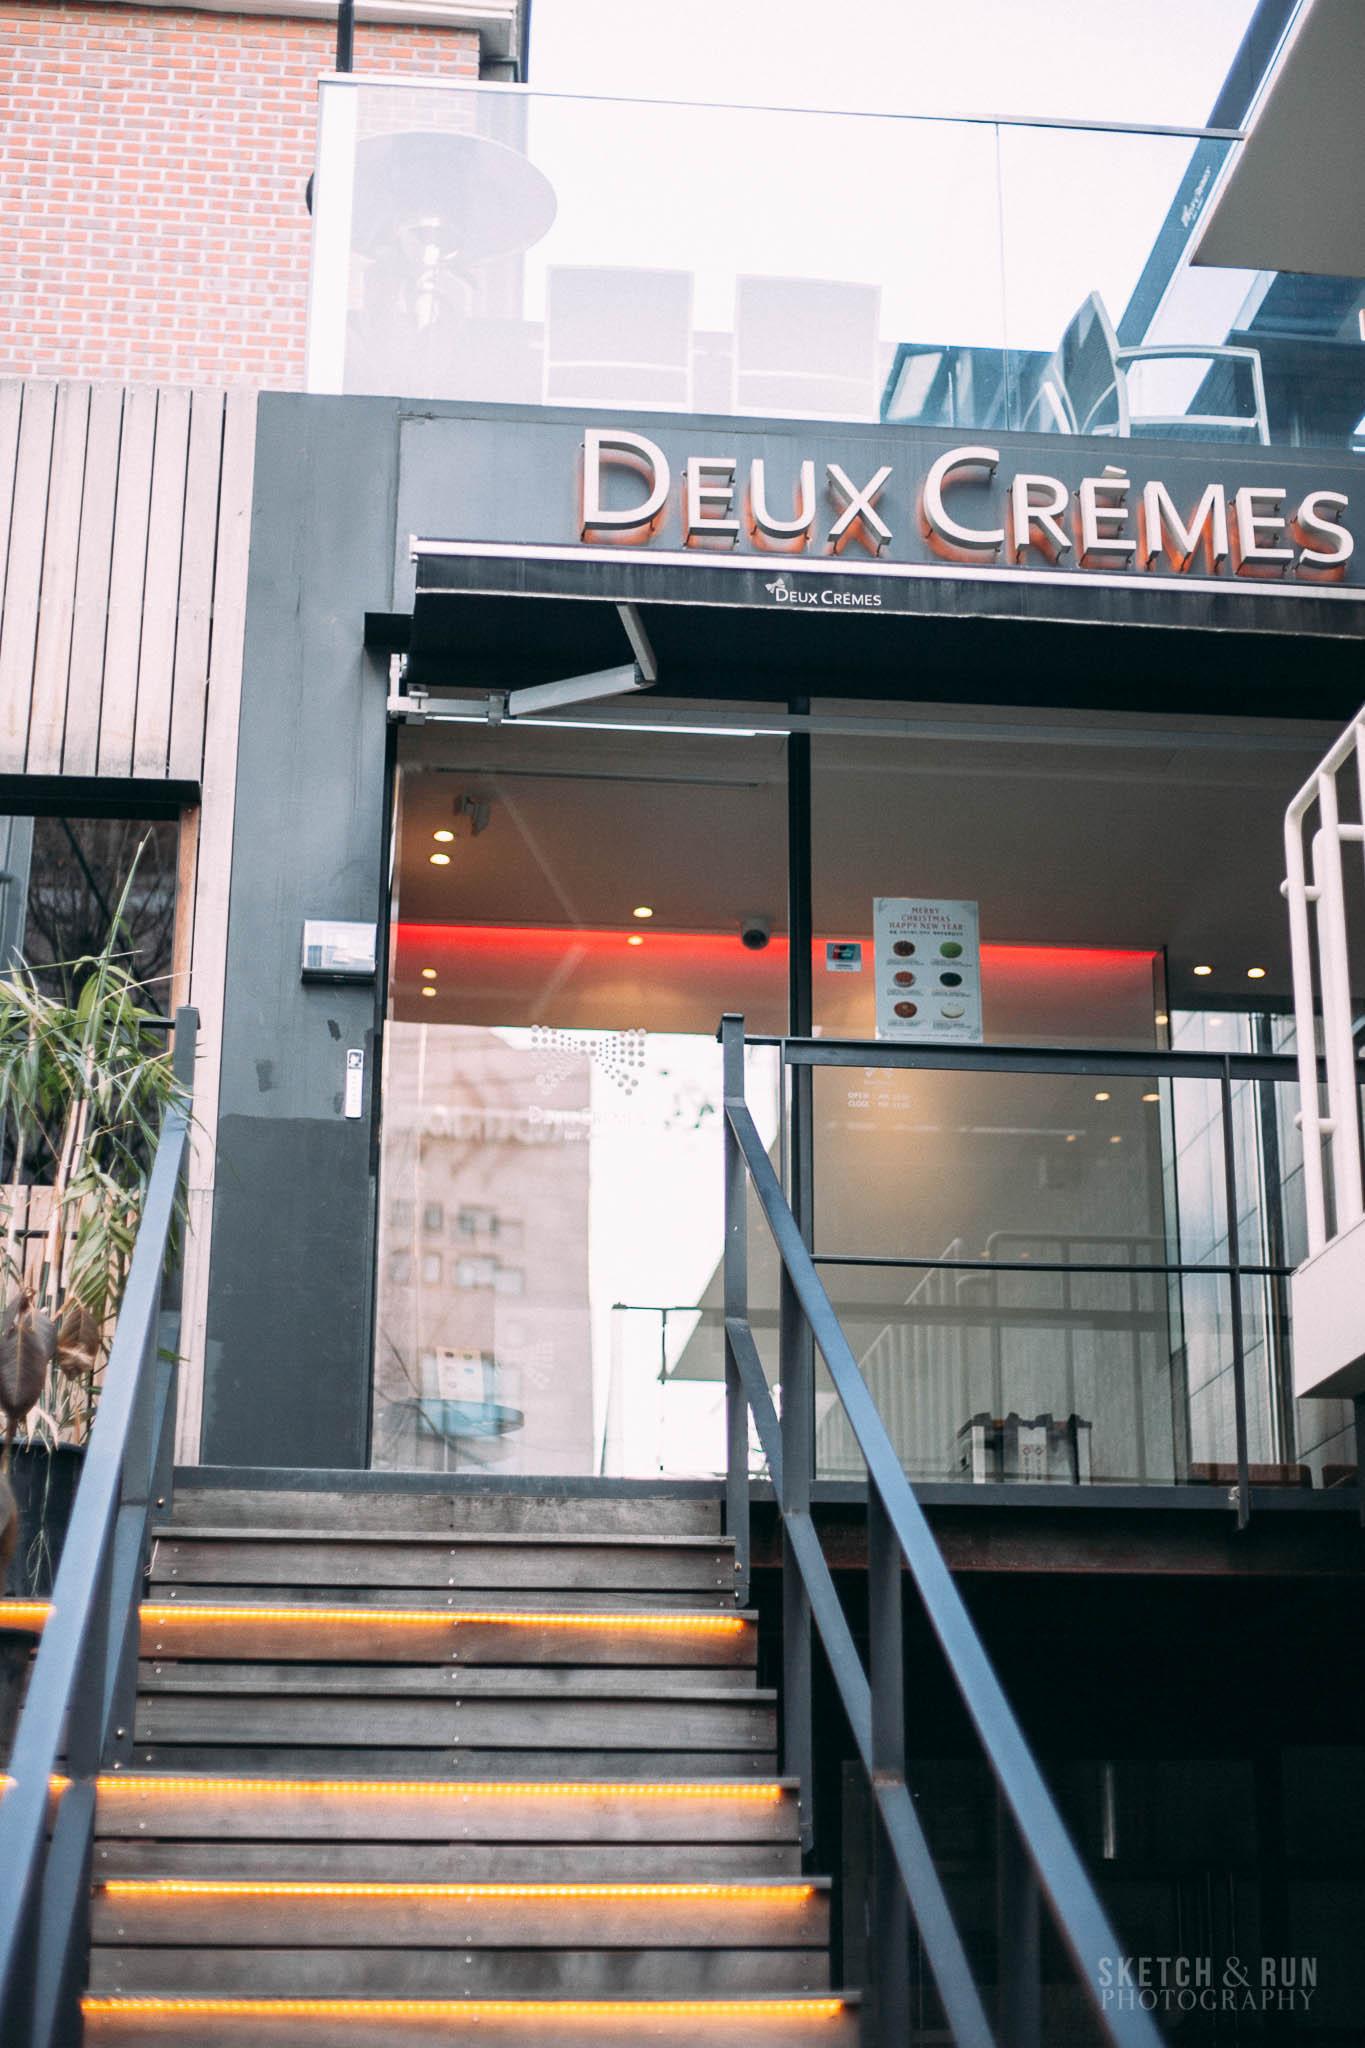 deux cremes patisserie, cake, tart, dessert, seoul, korea, travel, sketch and run